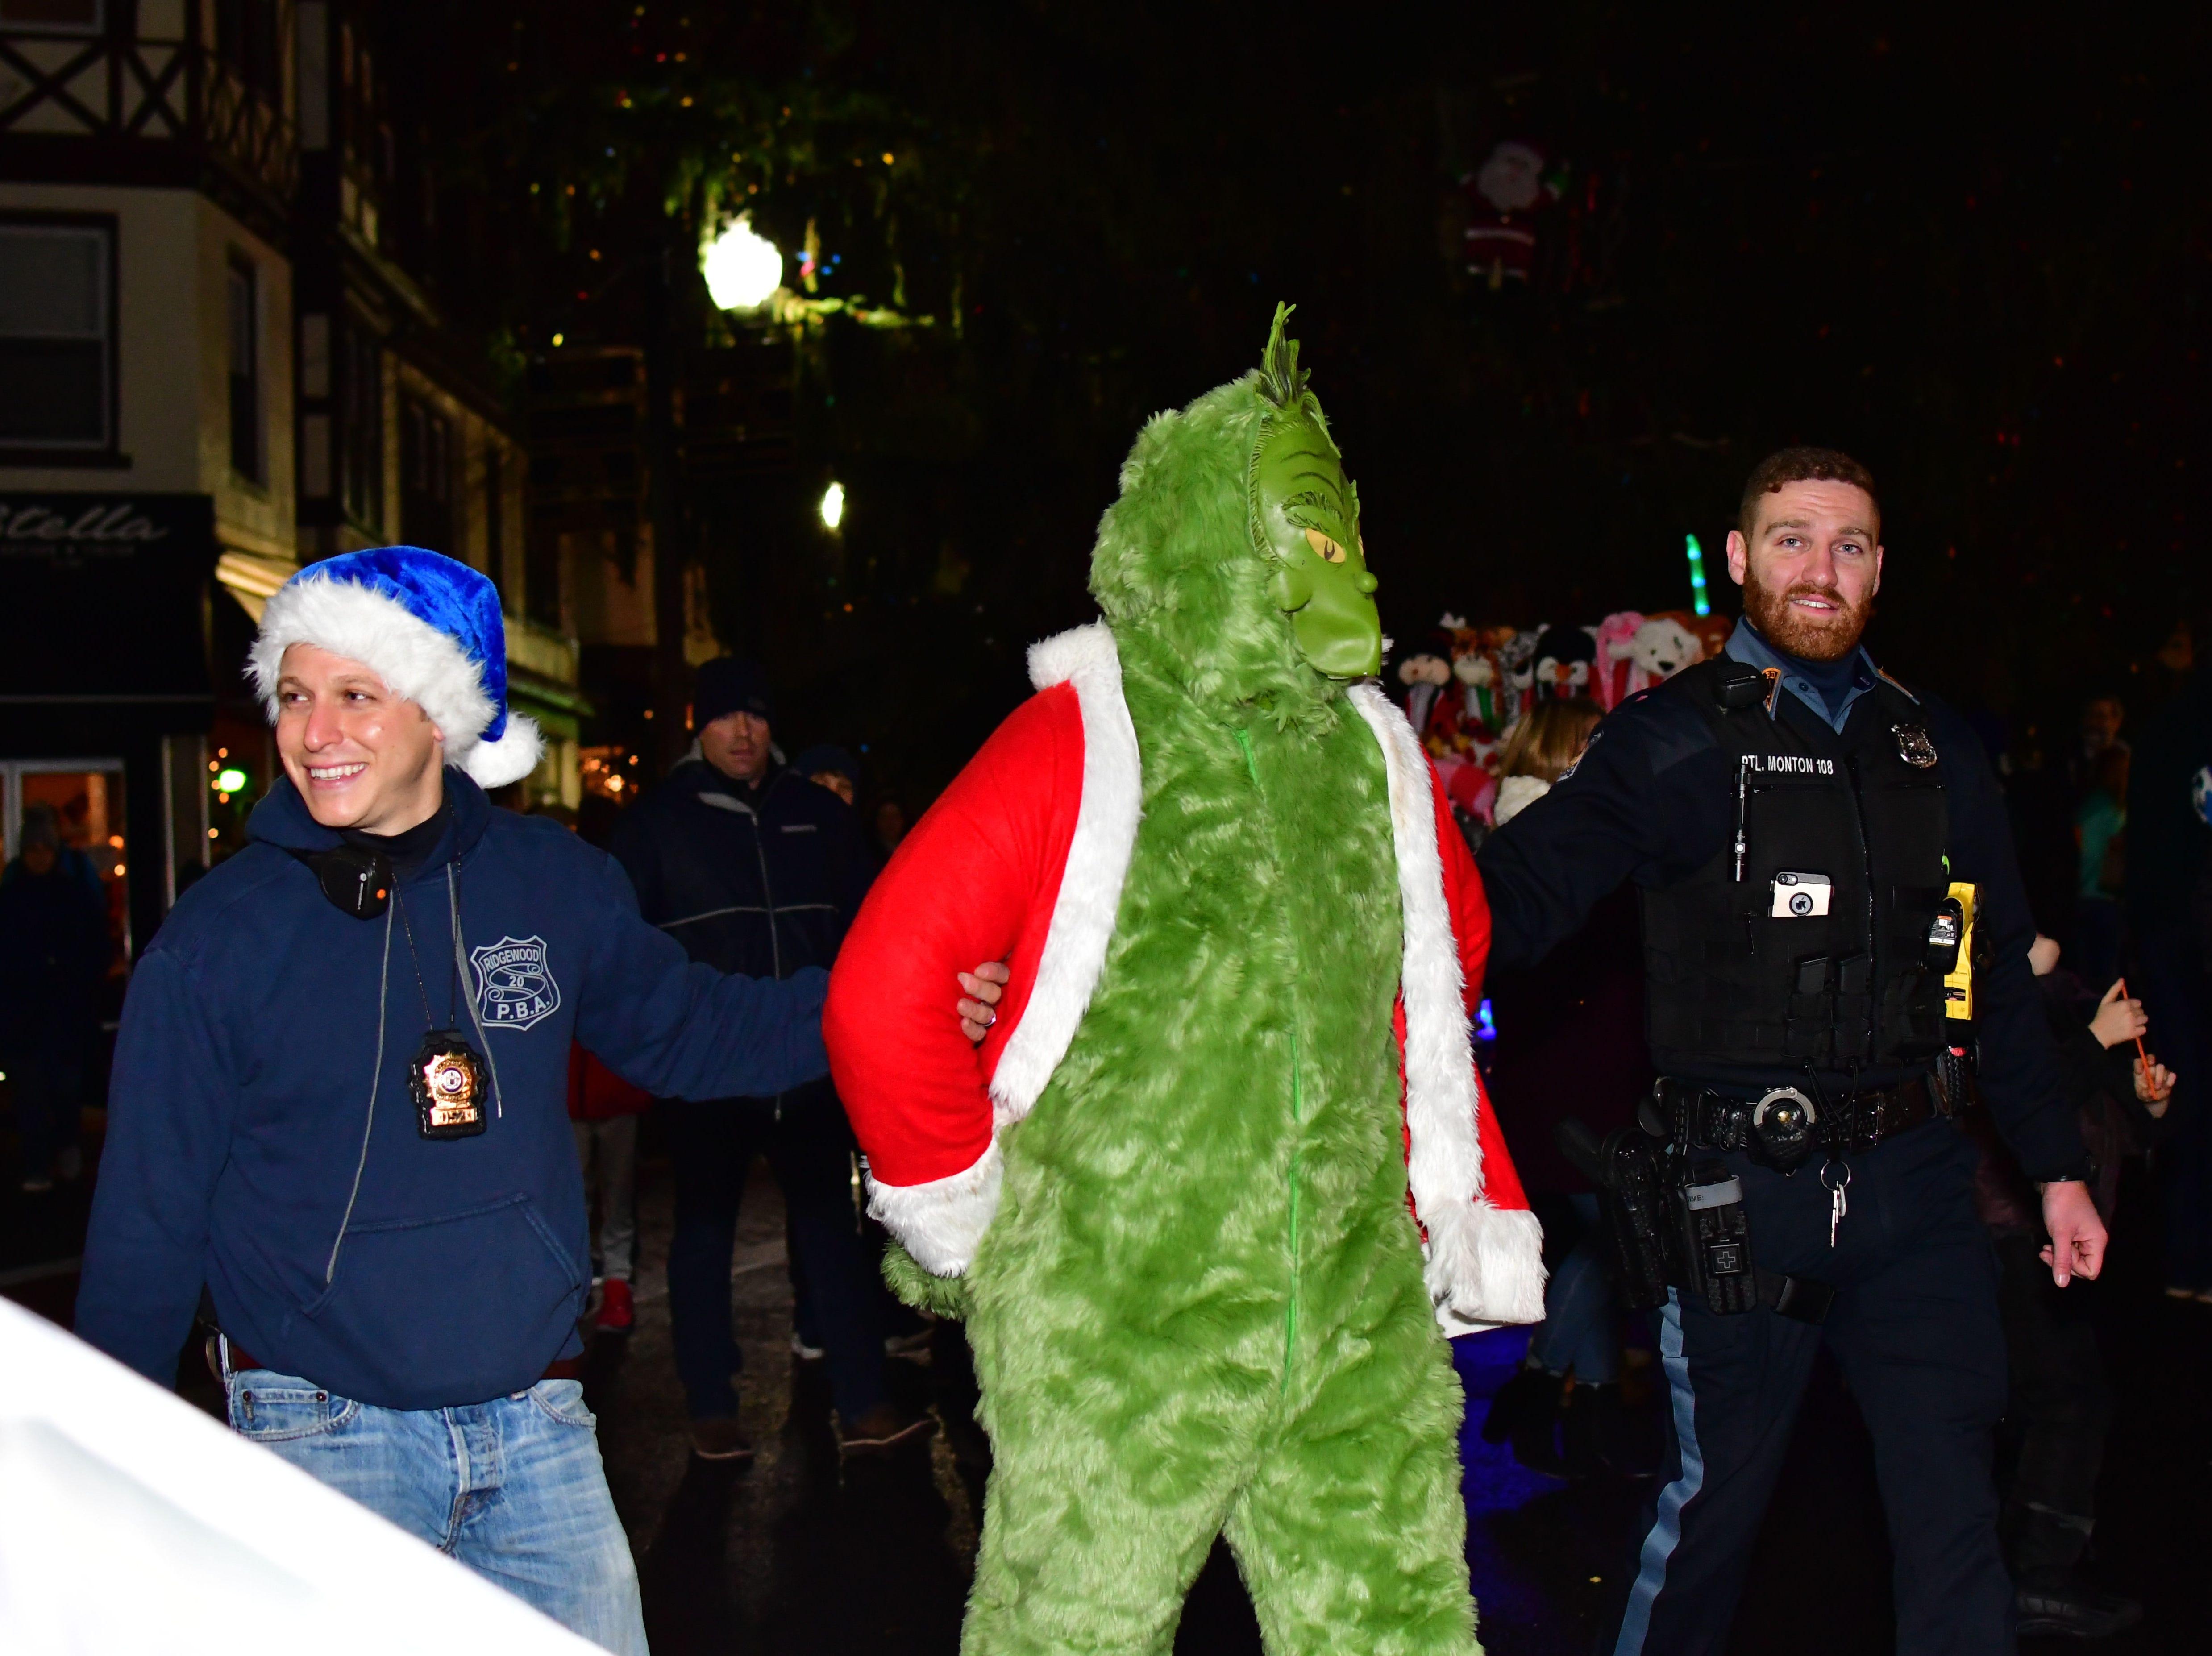 Grinch arrested.  Holiday festivities along East Ridgewood Avenue in Ridgewood on Nov. 30.